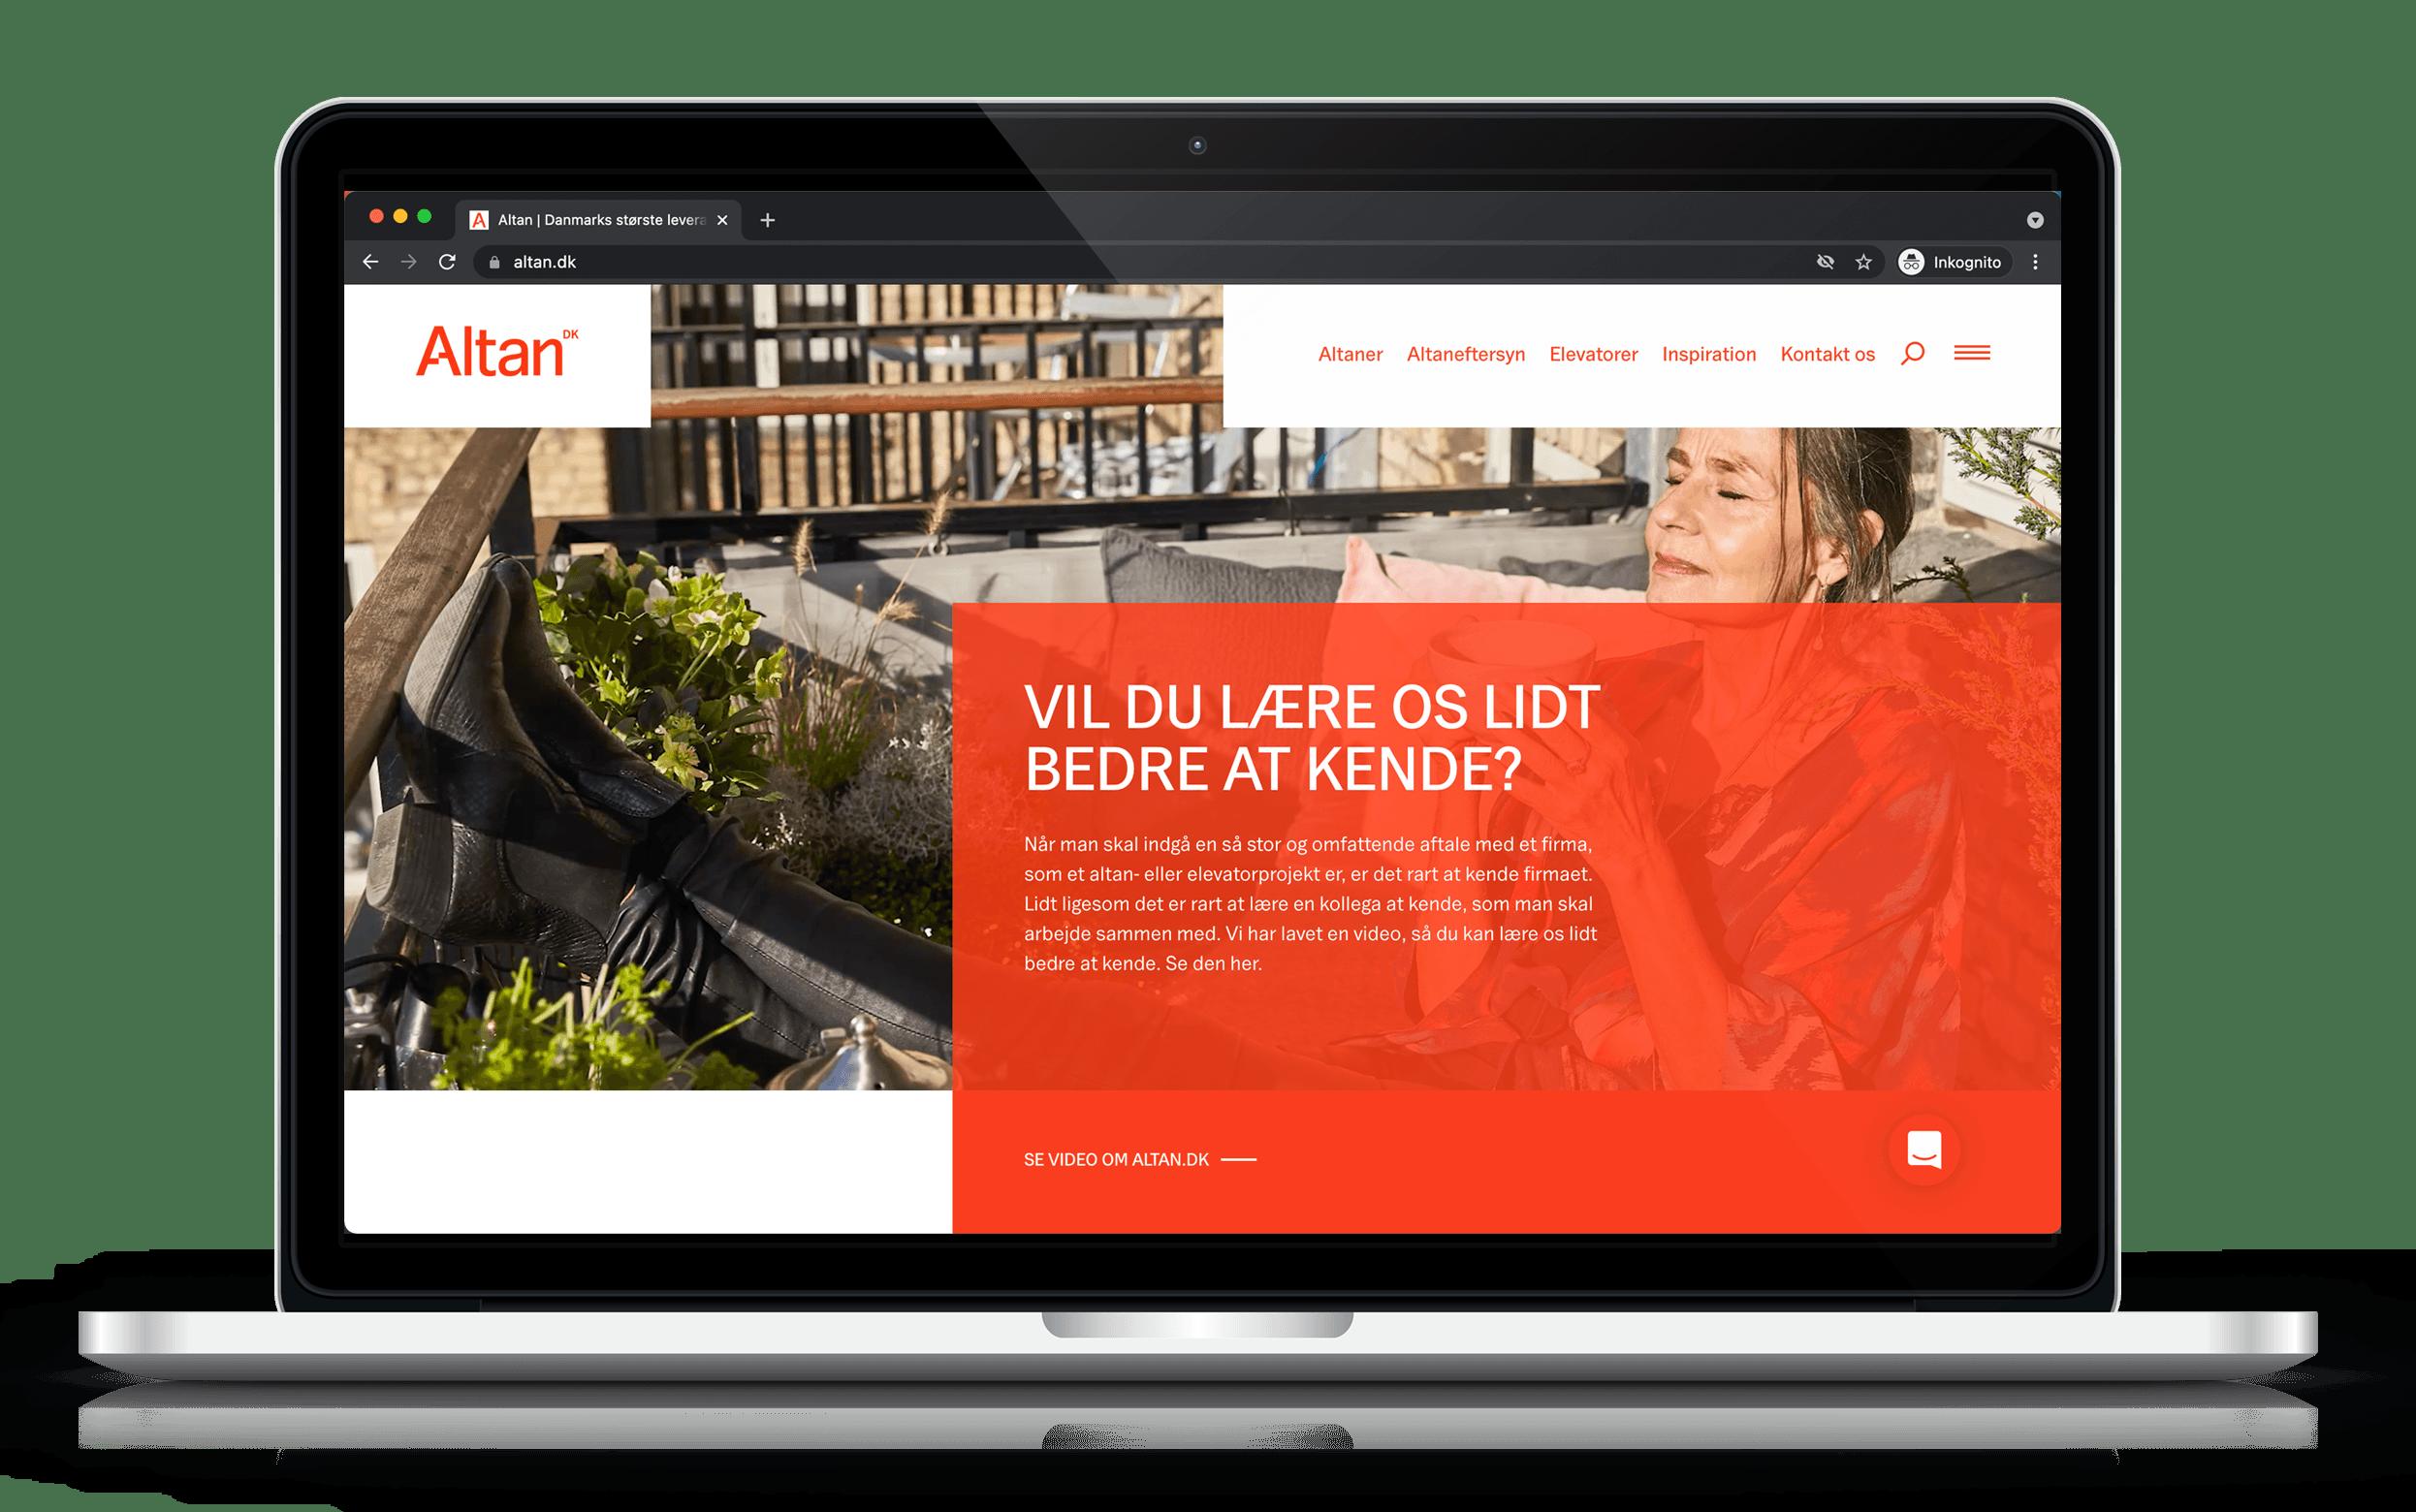 Altan.dk website